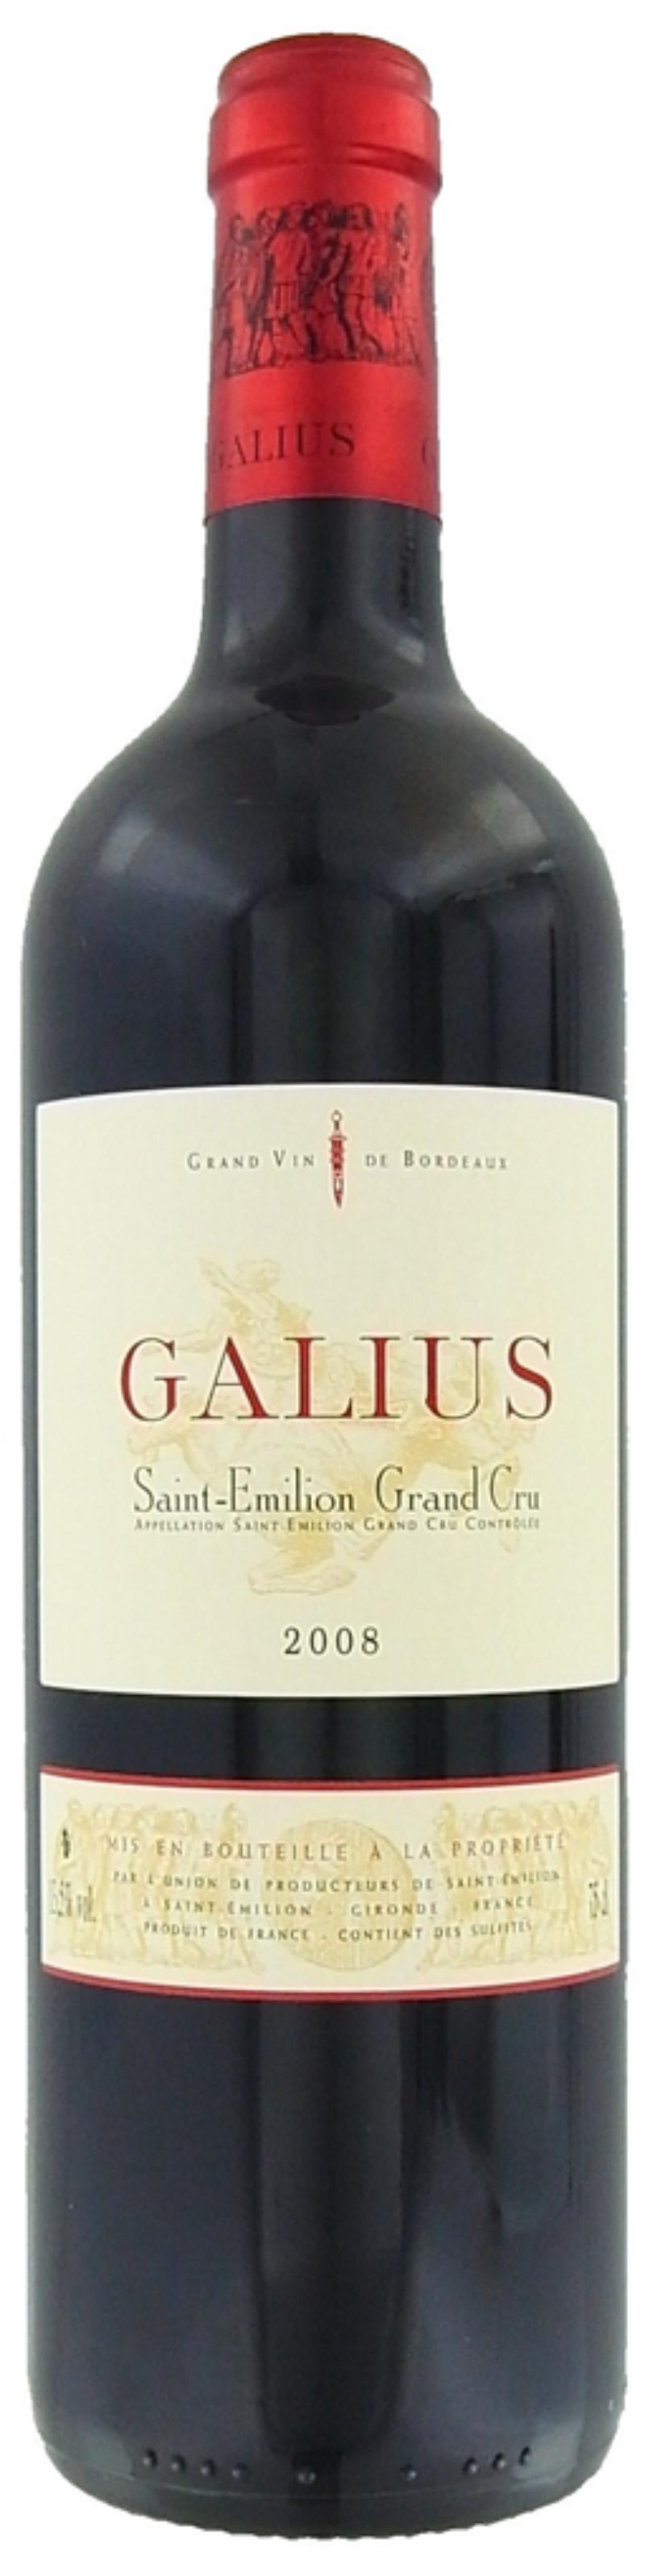 GALIUS-ST.EMILION-GRAND-CRU-2003